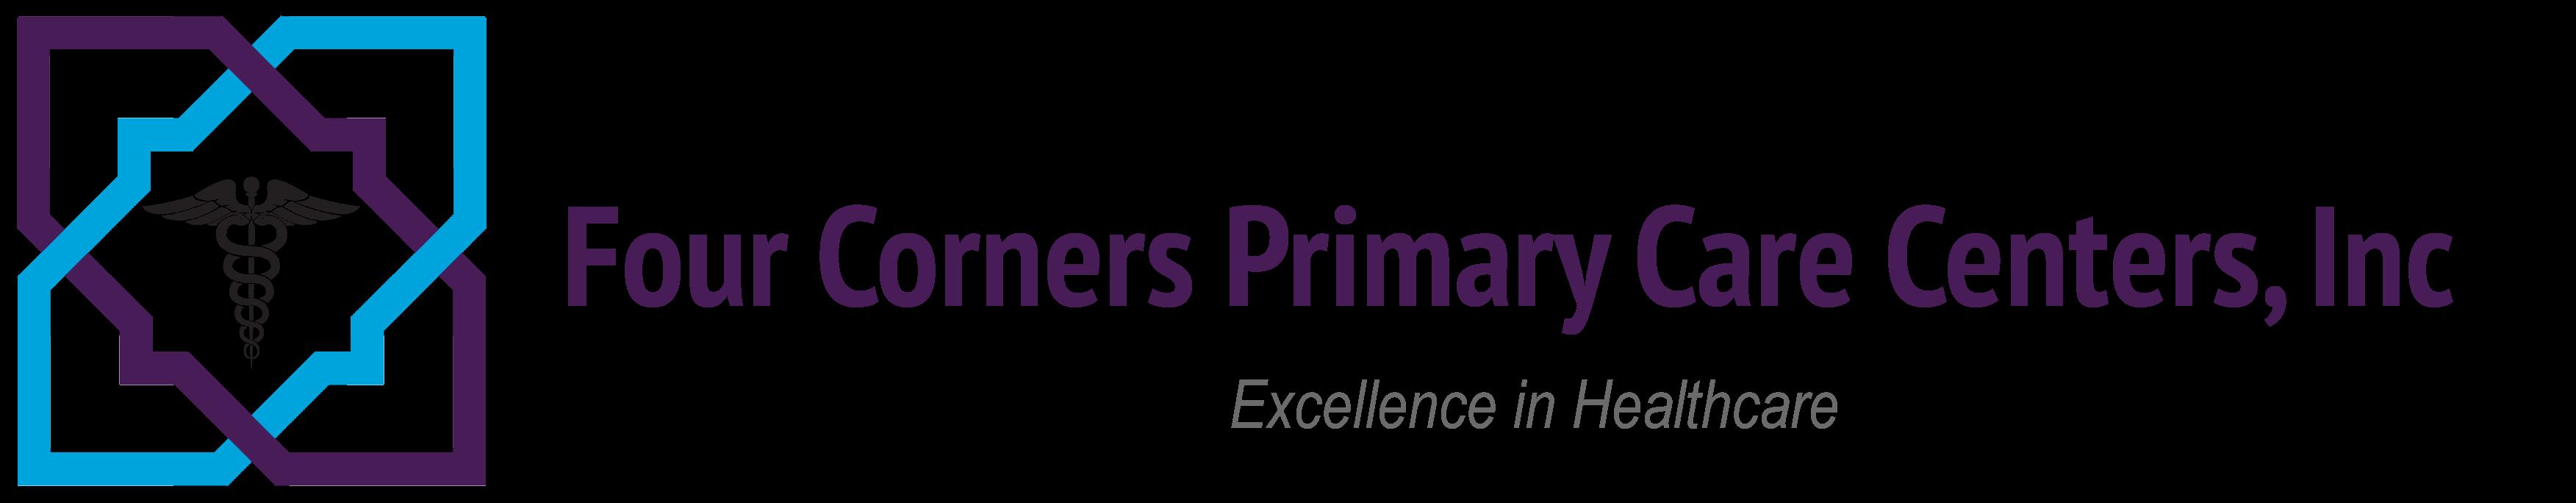 Four Corners Primary Care Centers, Inc.